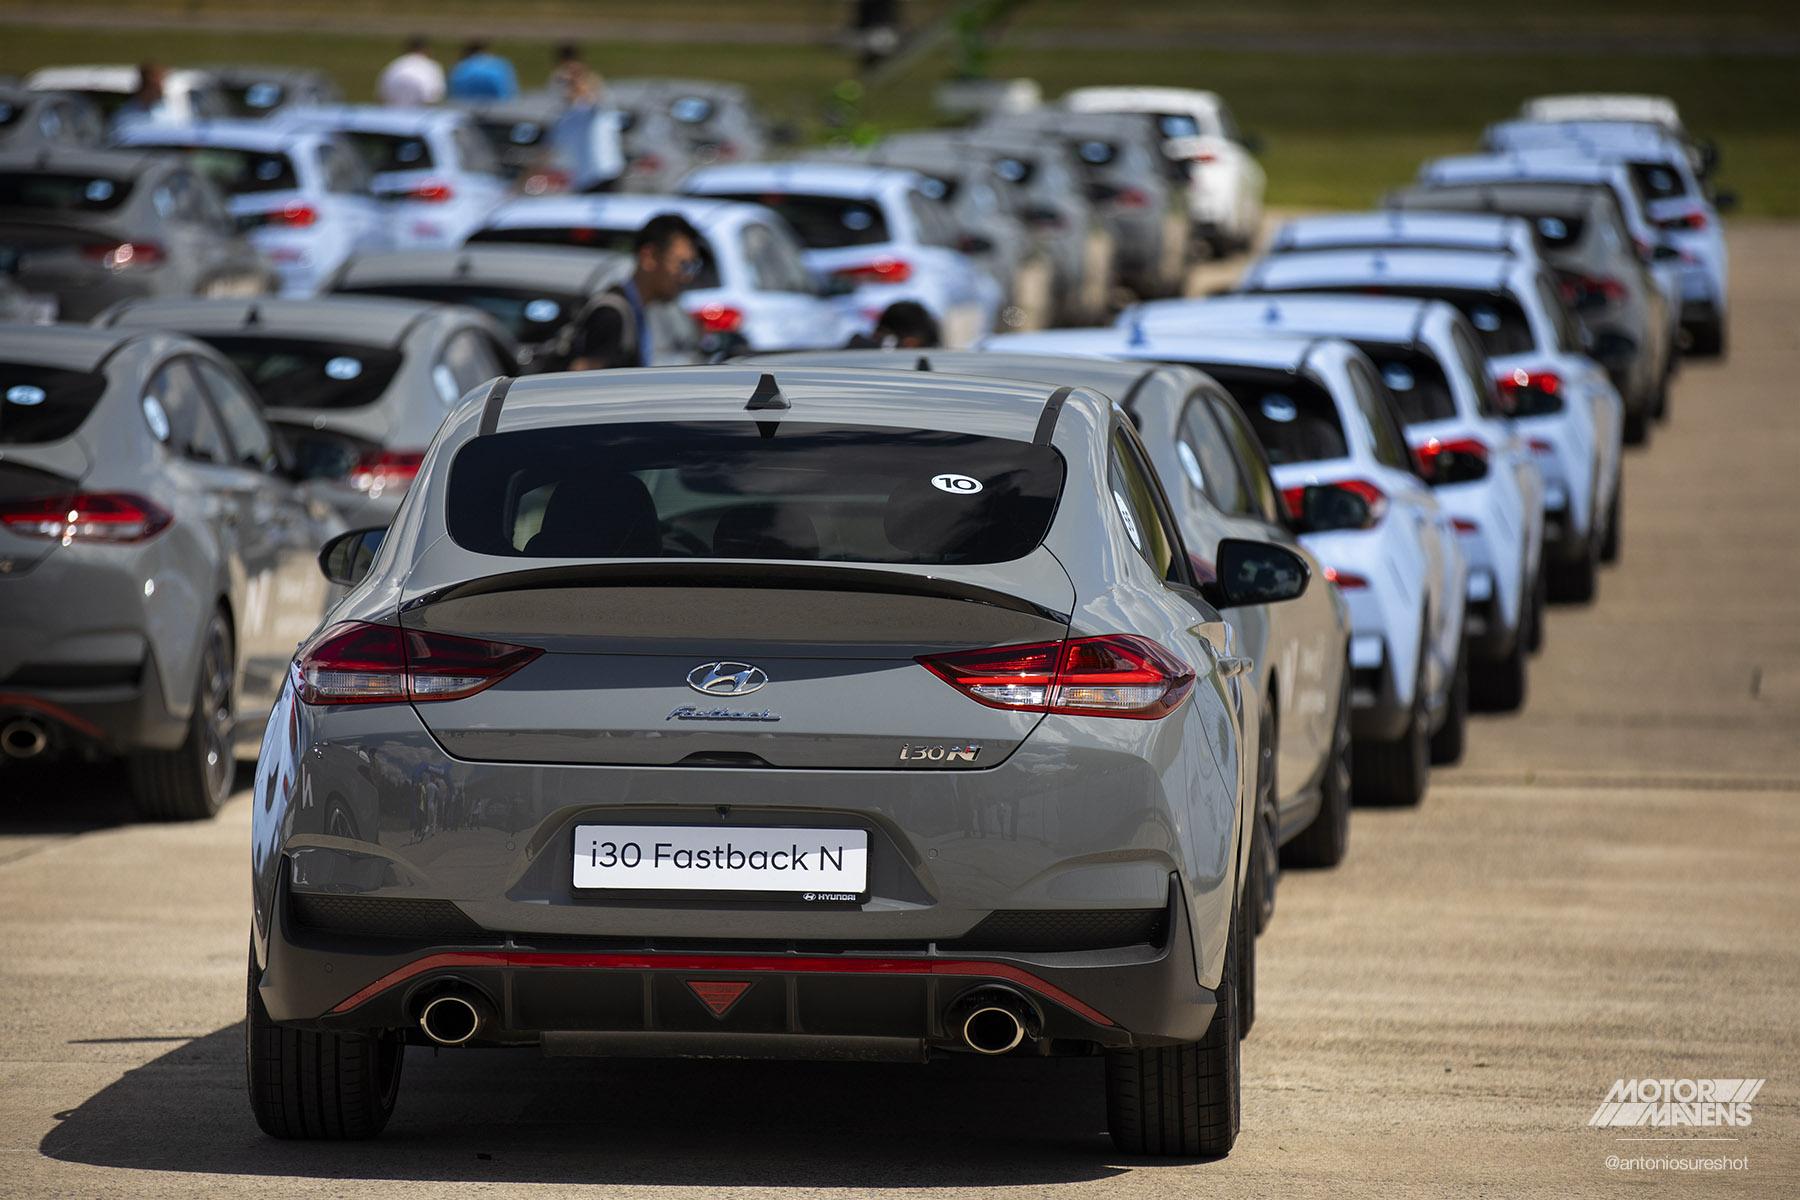 Hyundai i30 Fastback N, Nurburgring, 24H of Hyundai N Experience, Hyundai N, Nurburgring 24H, i30